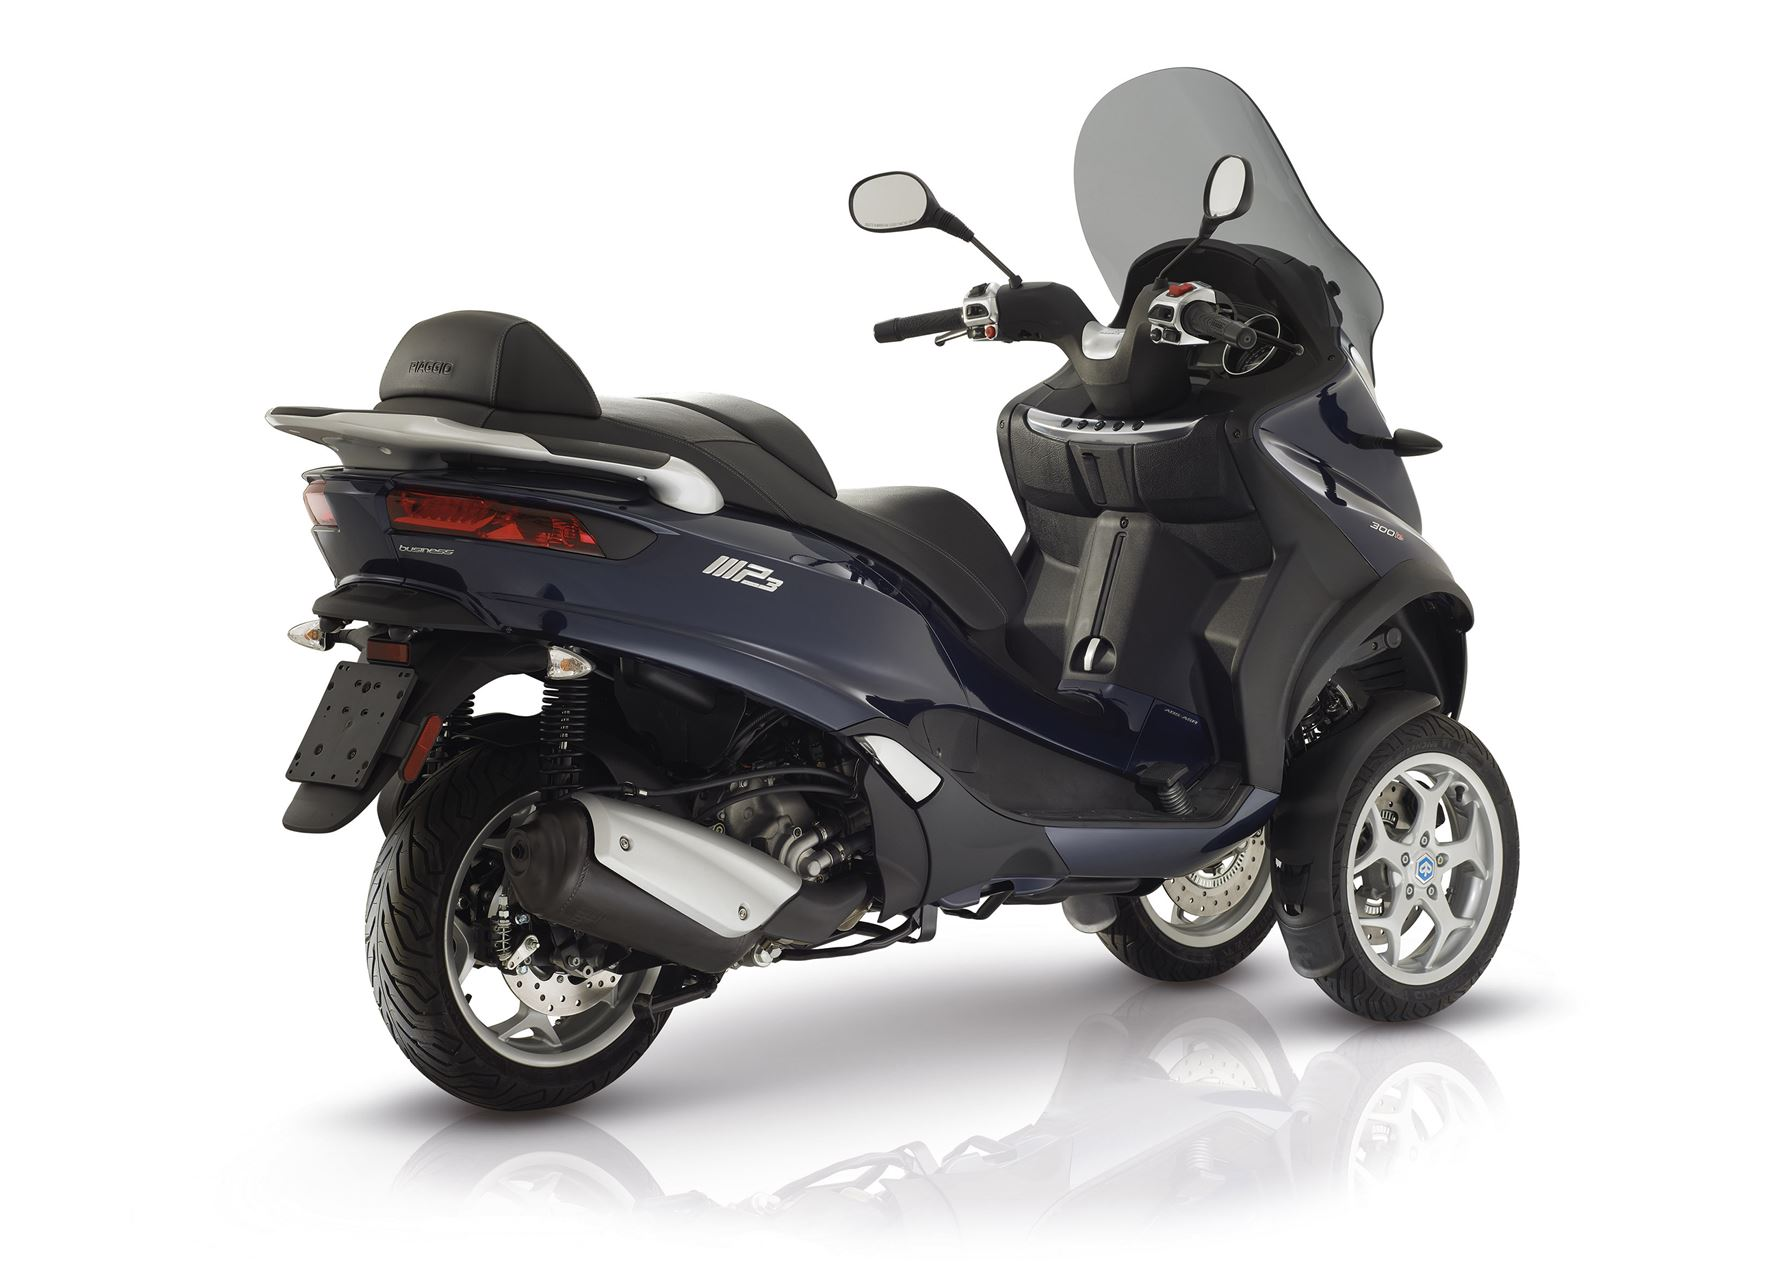 piaggio mp3 300 lt business scooter acima 125 cc lombas e curvas. Black Bedroom Furniture Sets. Home Design Ideas